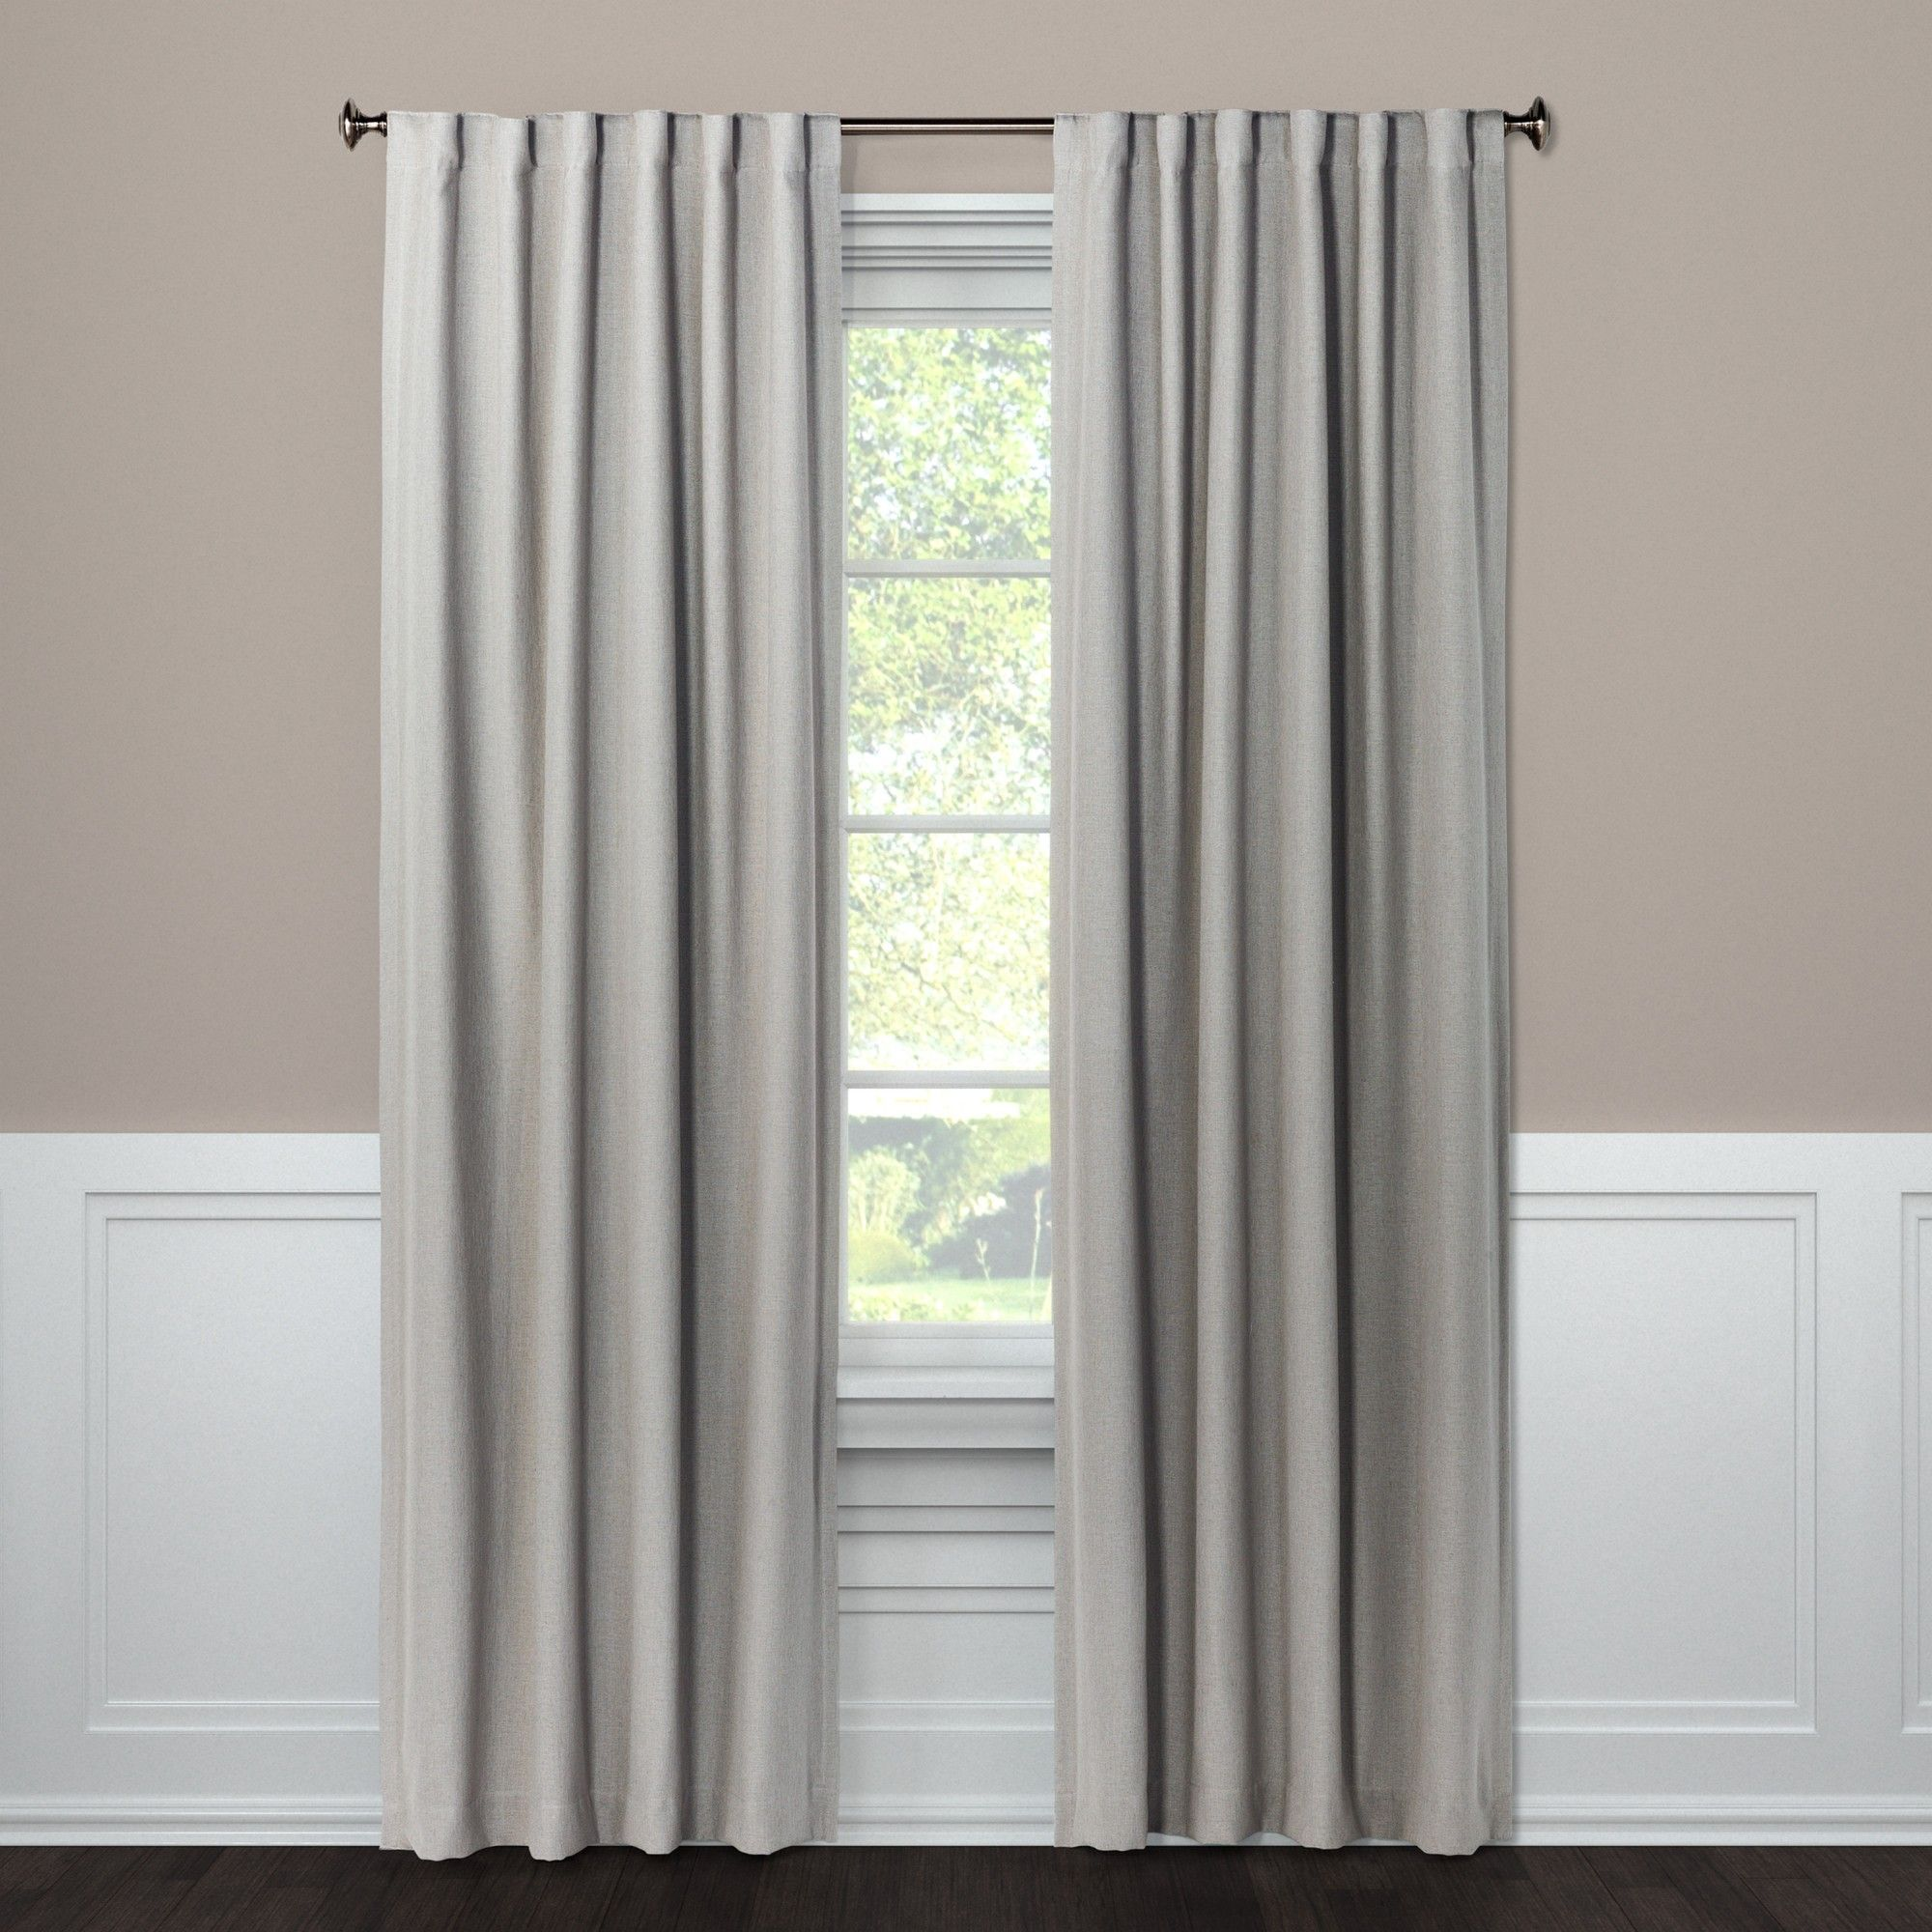 50 X108 Aruba Linen Blackout Curtain Panel Gray Stone Threshold